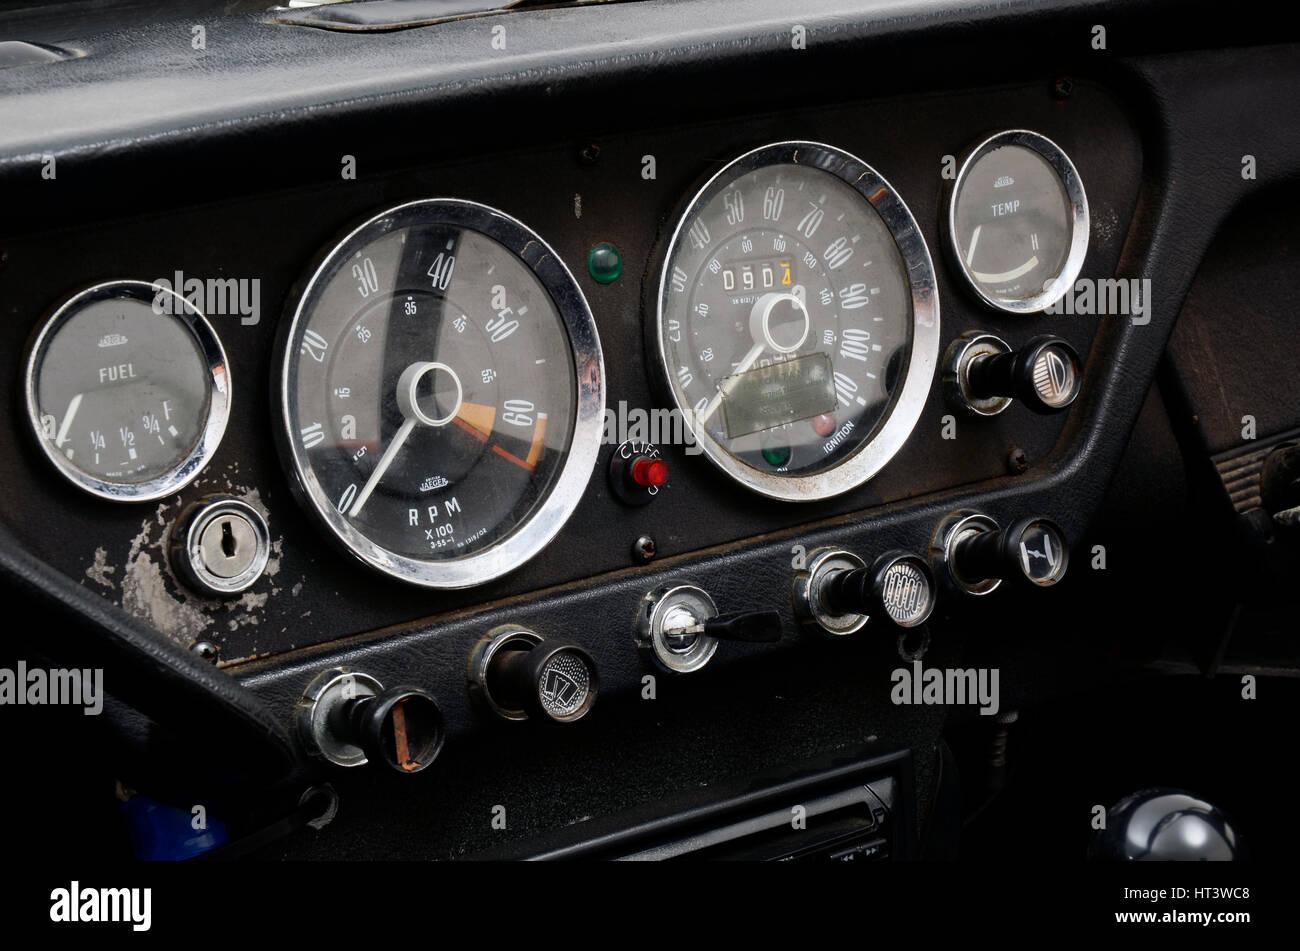 1966 Triumph Spitfire Mk2 Artist Unknown Stock Photo 135310120 Alamy